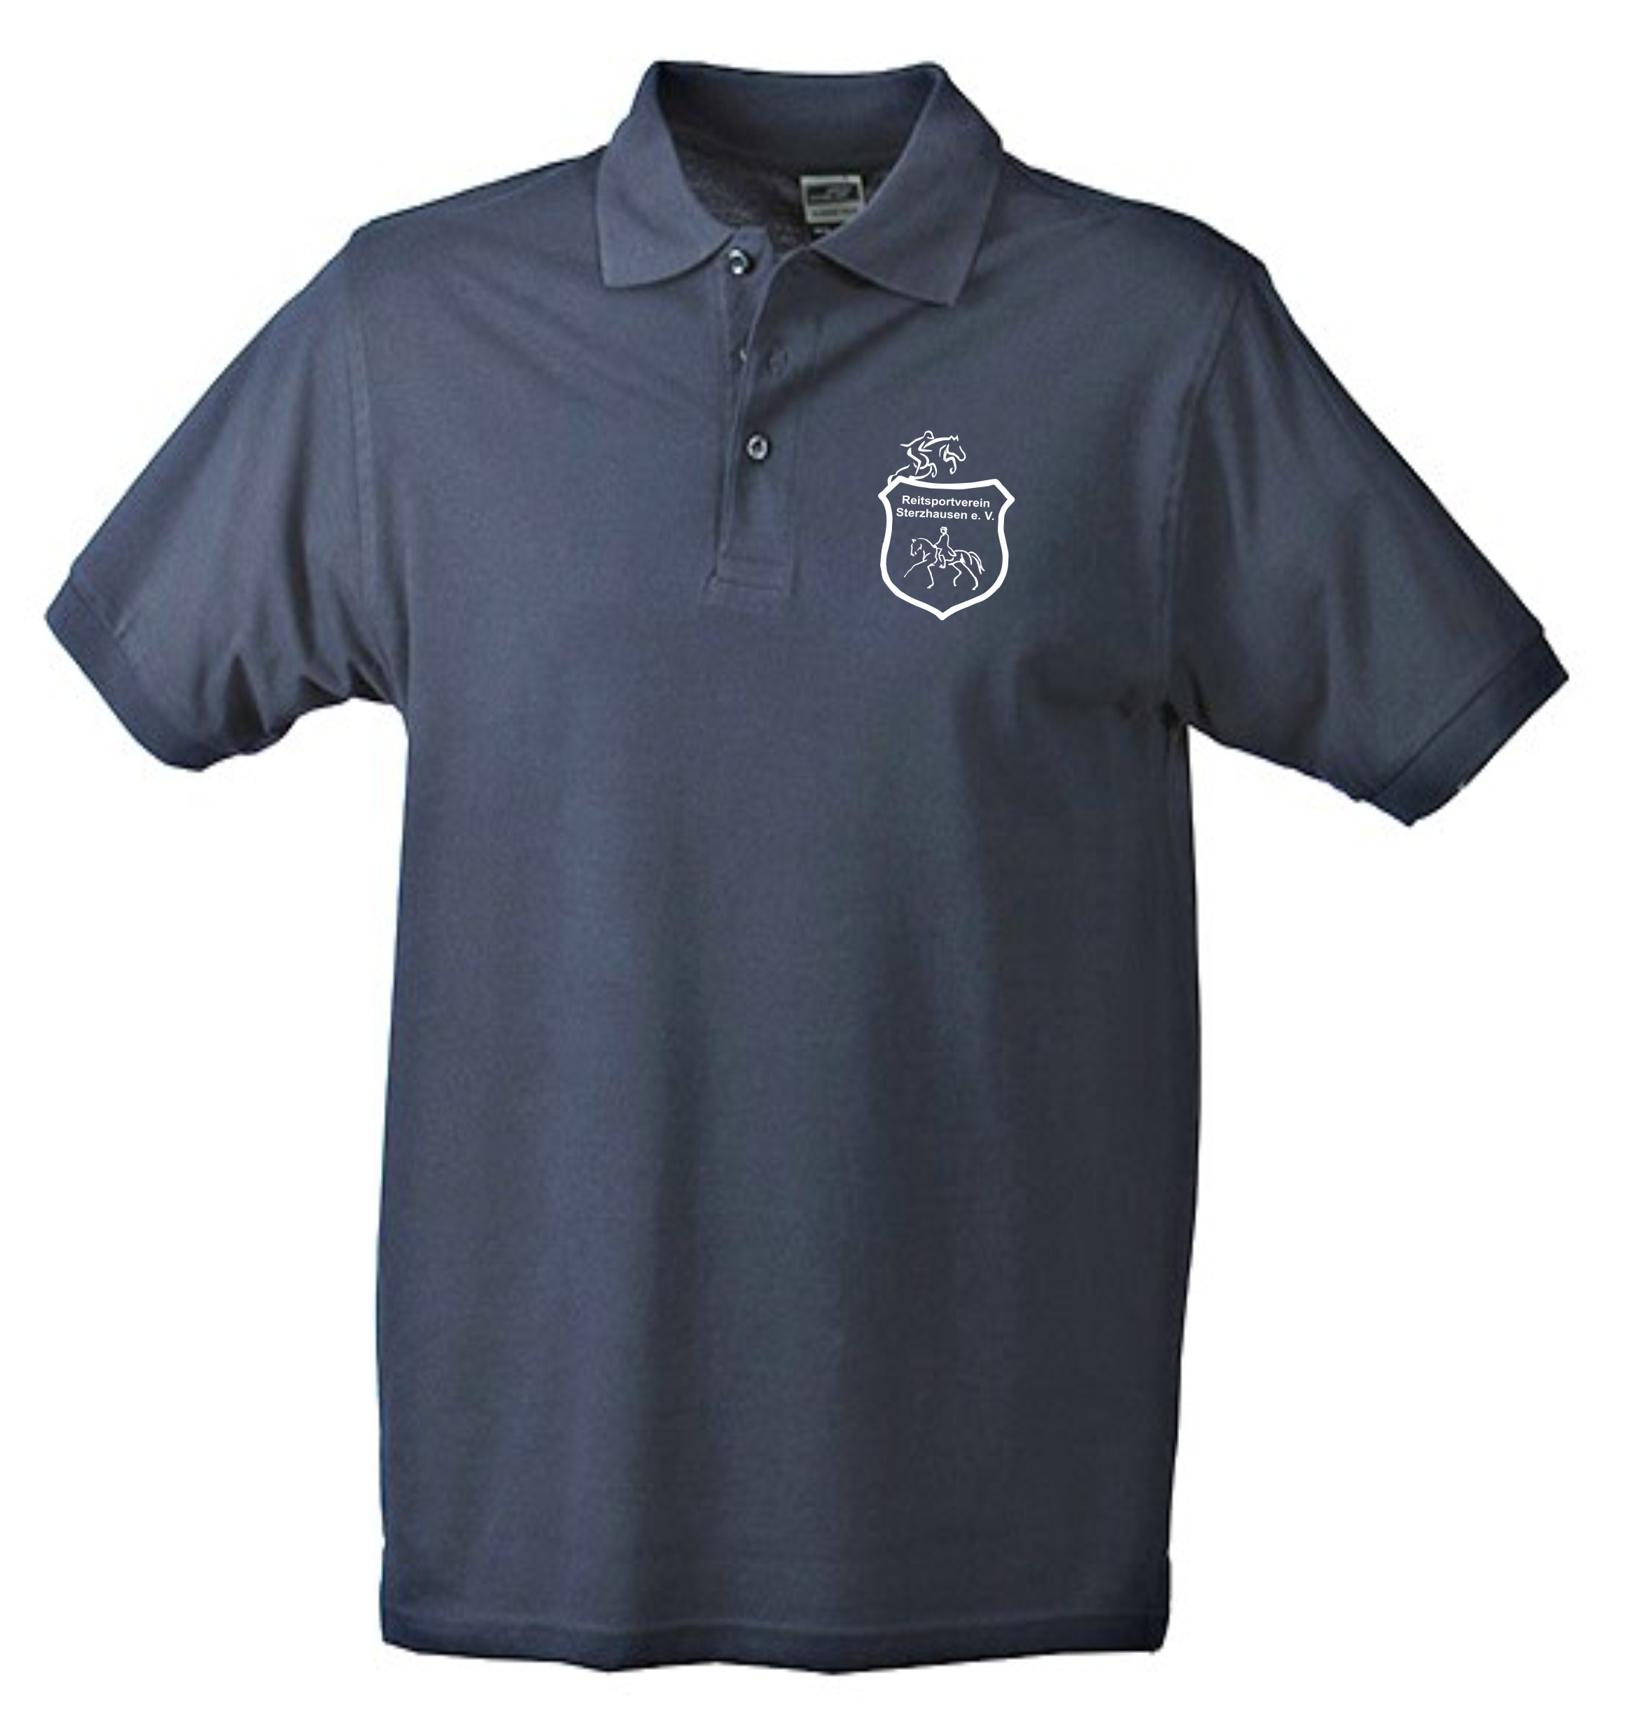 kinder polo shirt rsv sterzhausen reitsportverein. Black Bedroom Furniture Sets. Home Design Ideas